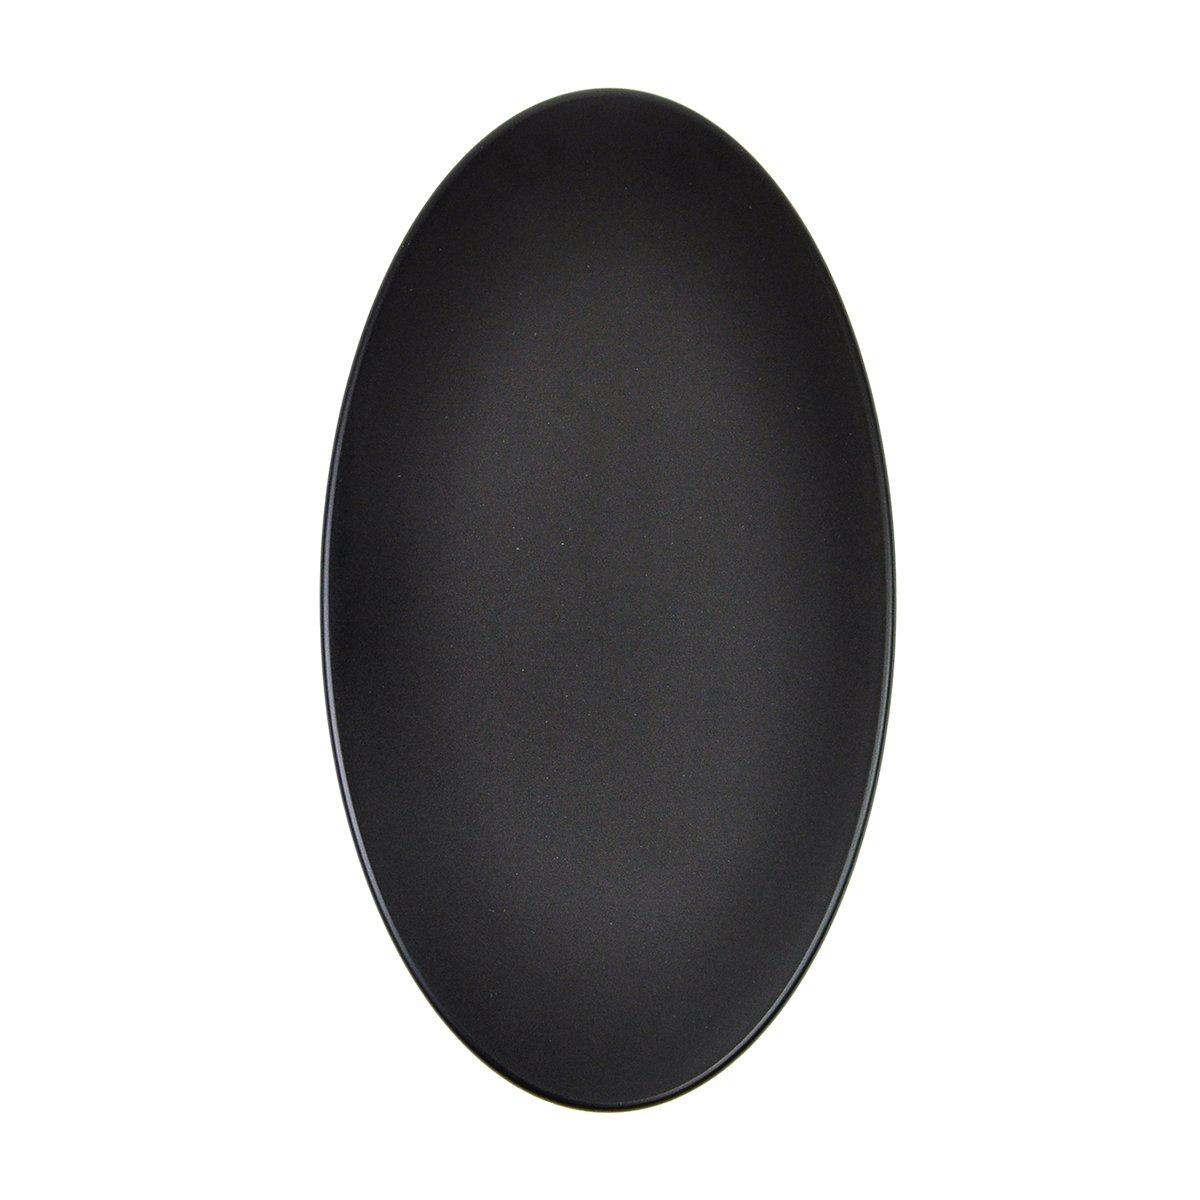 Minelab Elliptical Skidplate Spare Garden Accessory, 10-Inch, Black